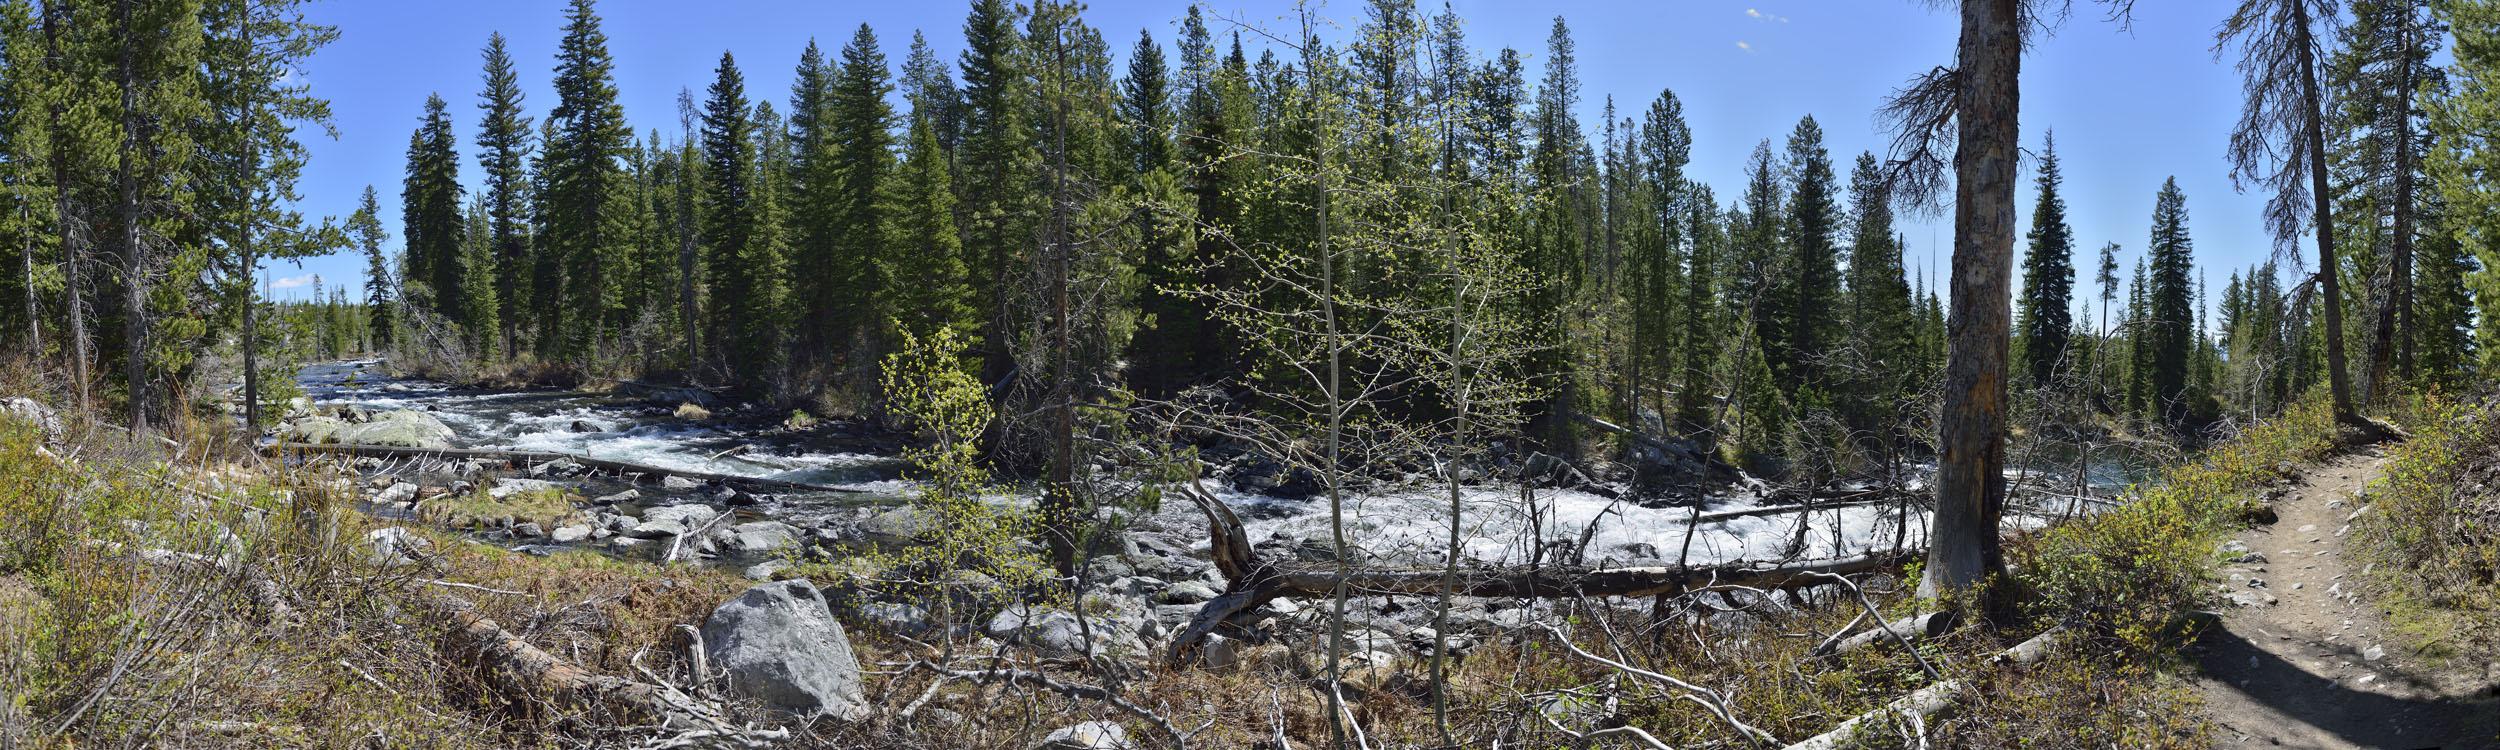 Trail along Cascade Creek